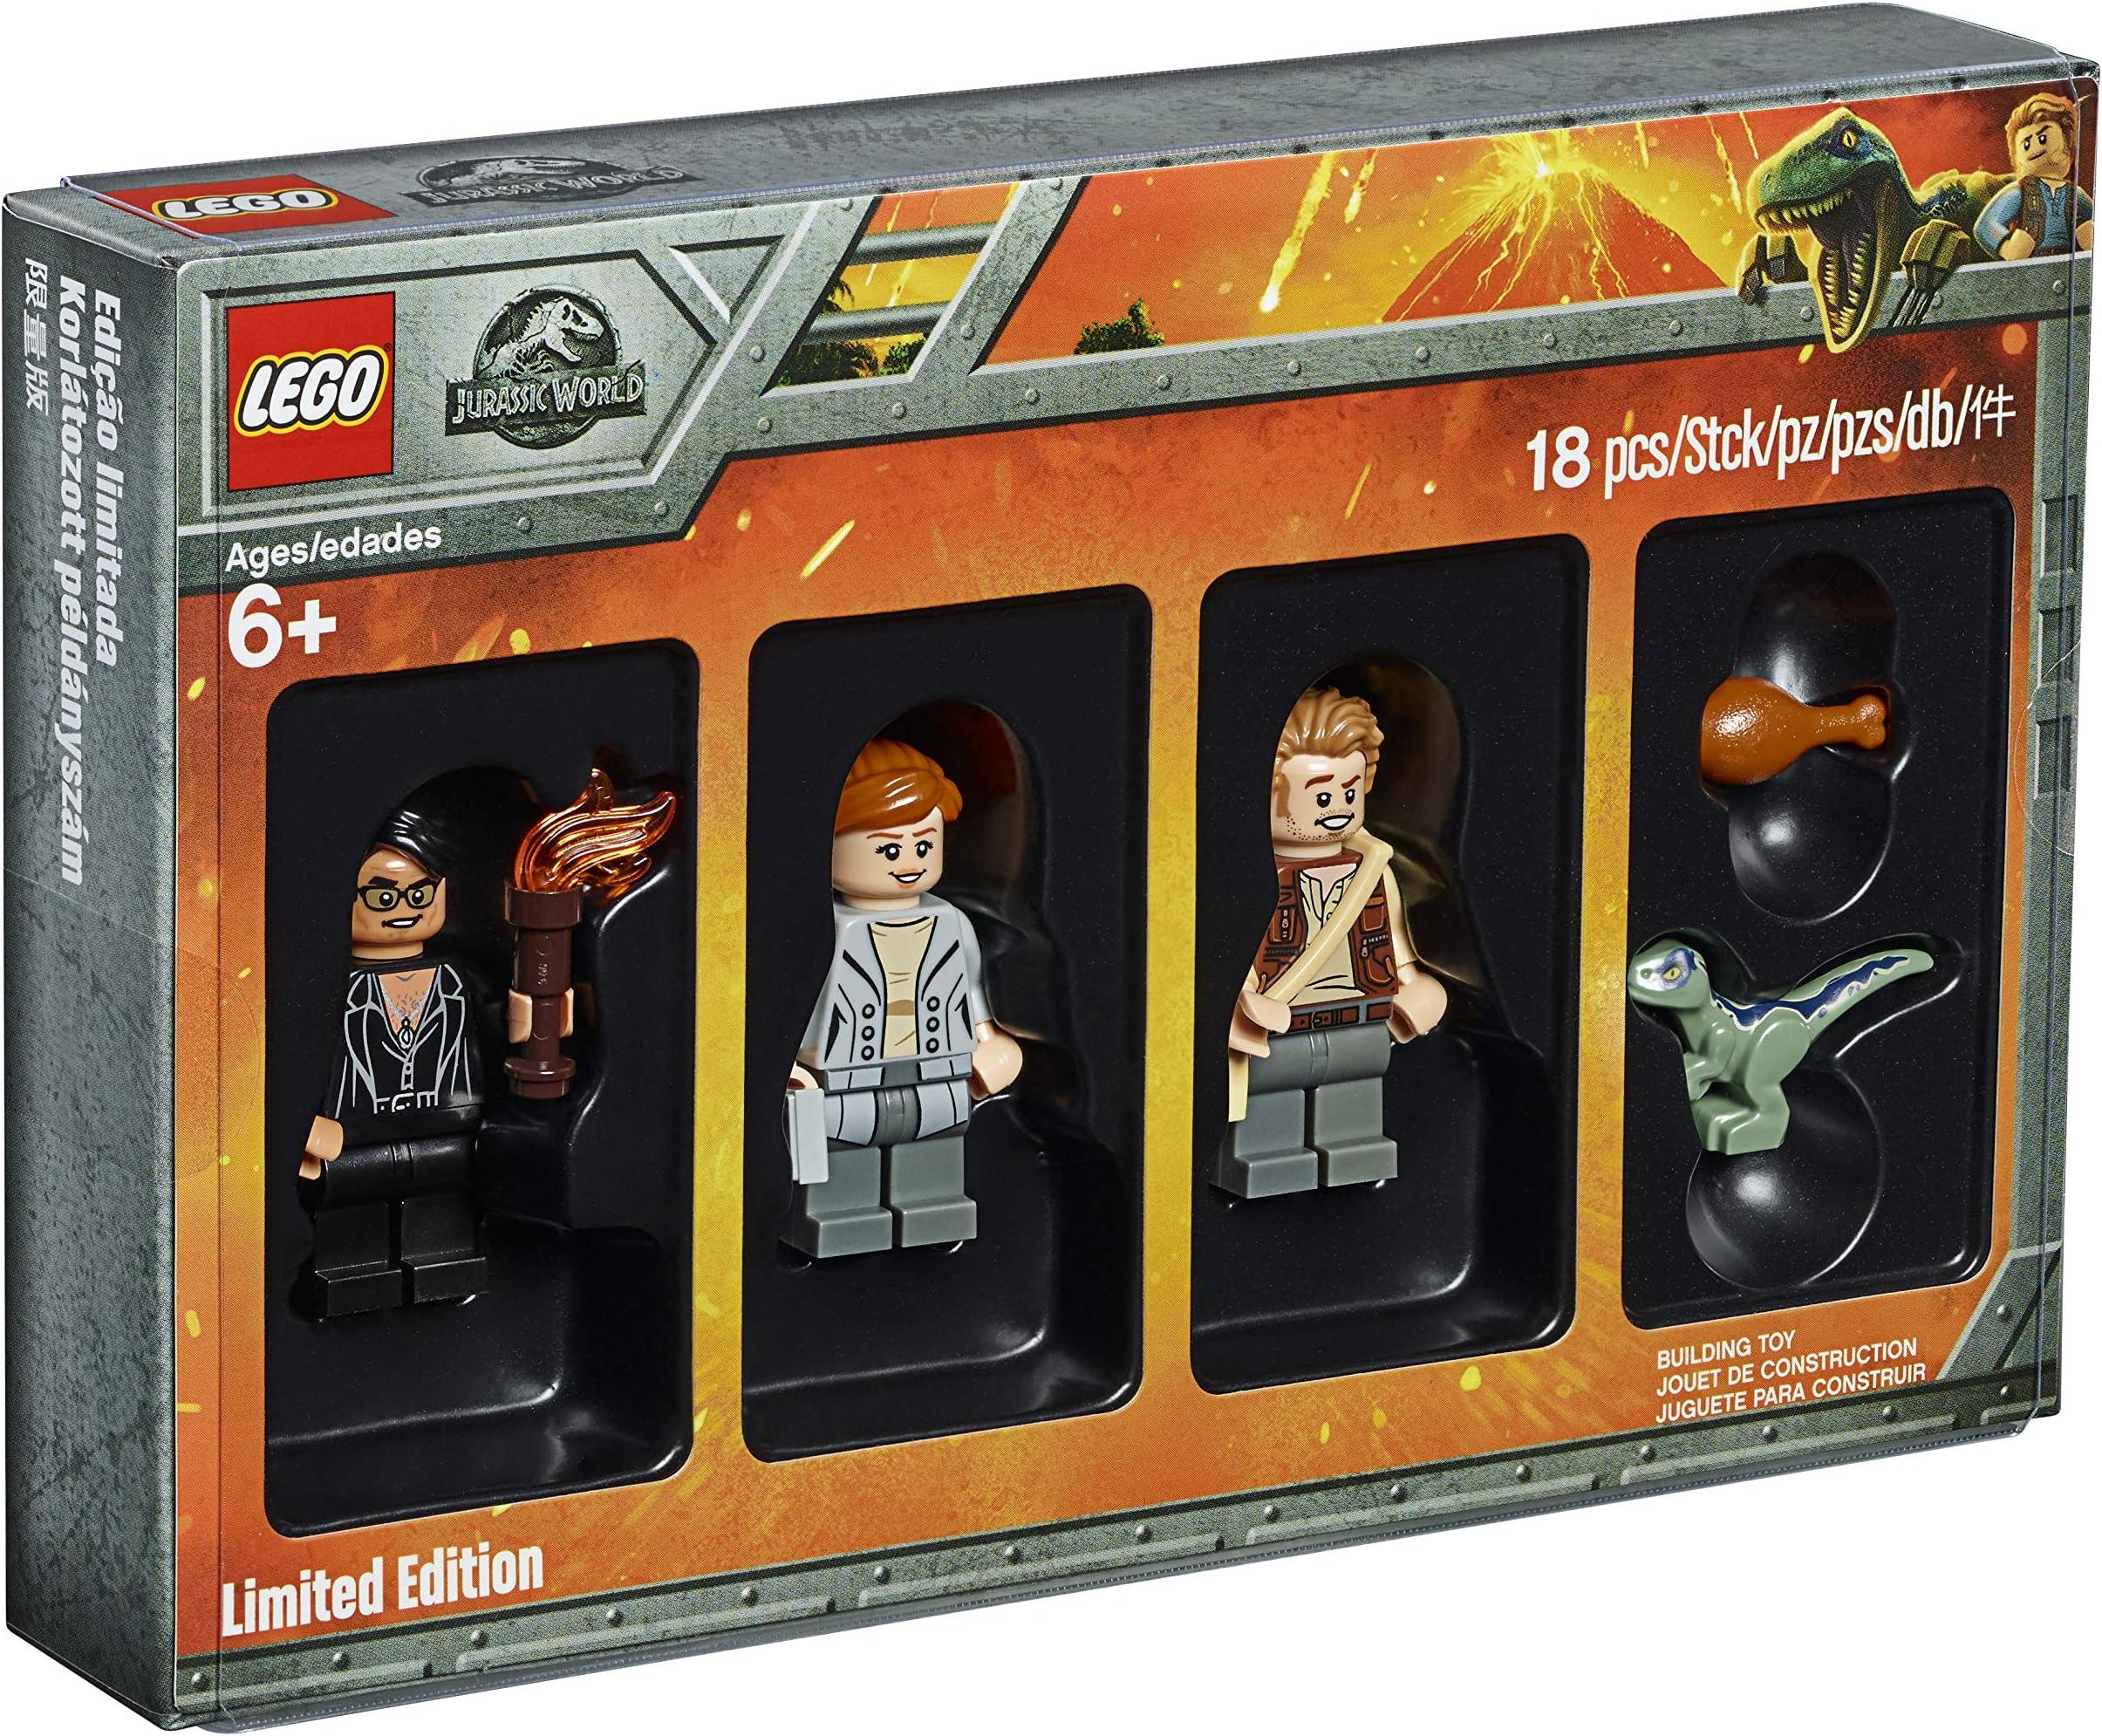 Lego Jurassic World Owen Grady minifigure W// Cycle 75930